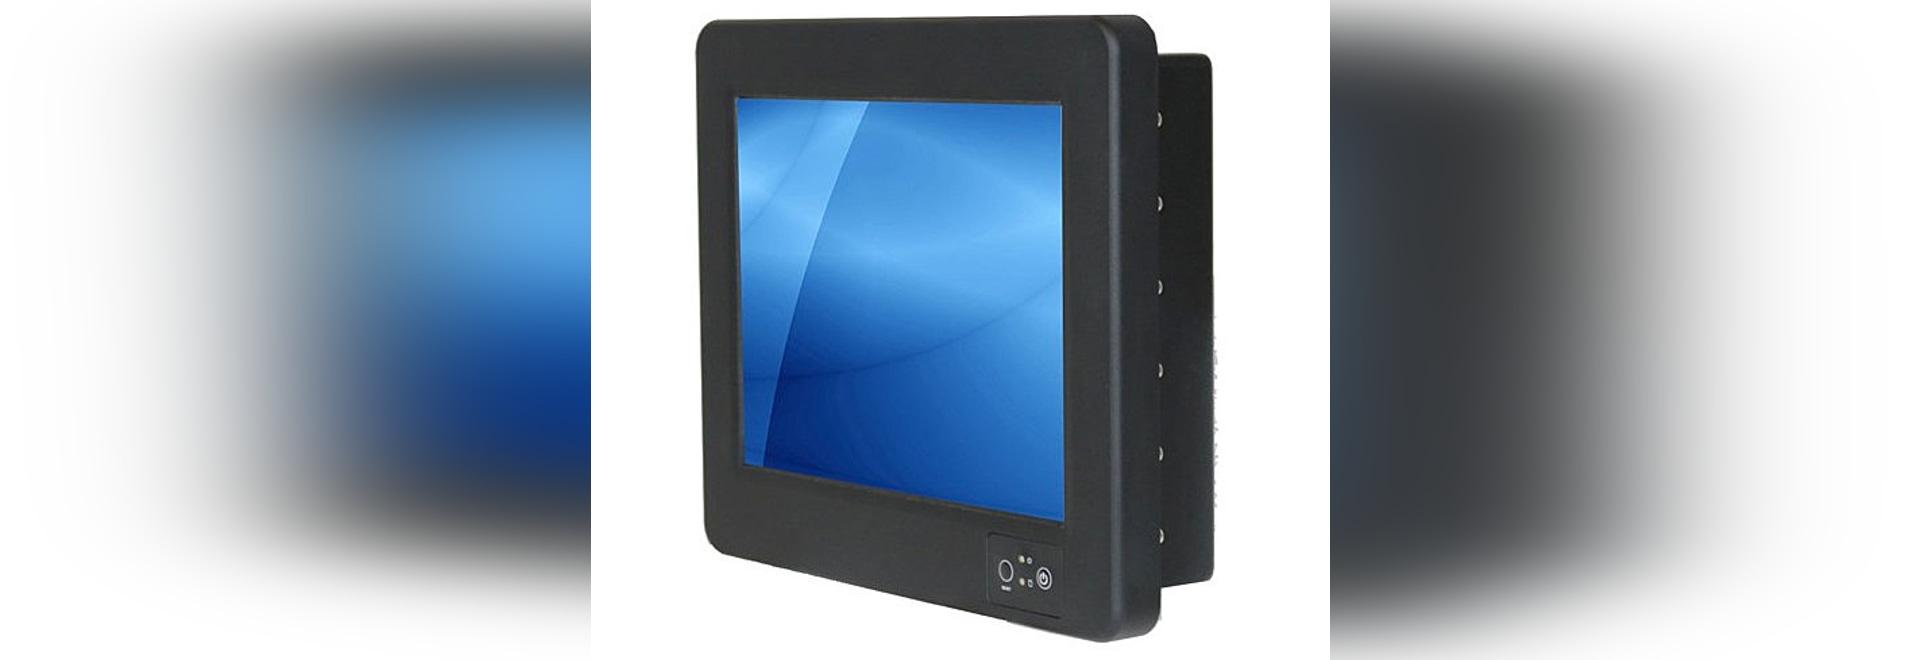 "Militaire Grade 10.4 ""Panel PC Presents Celeron Bay Trail N2930 1,83-GHz"